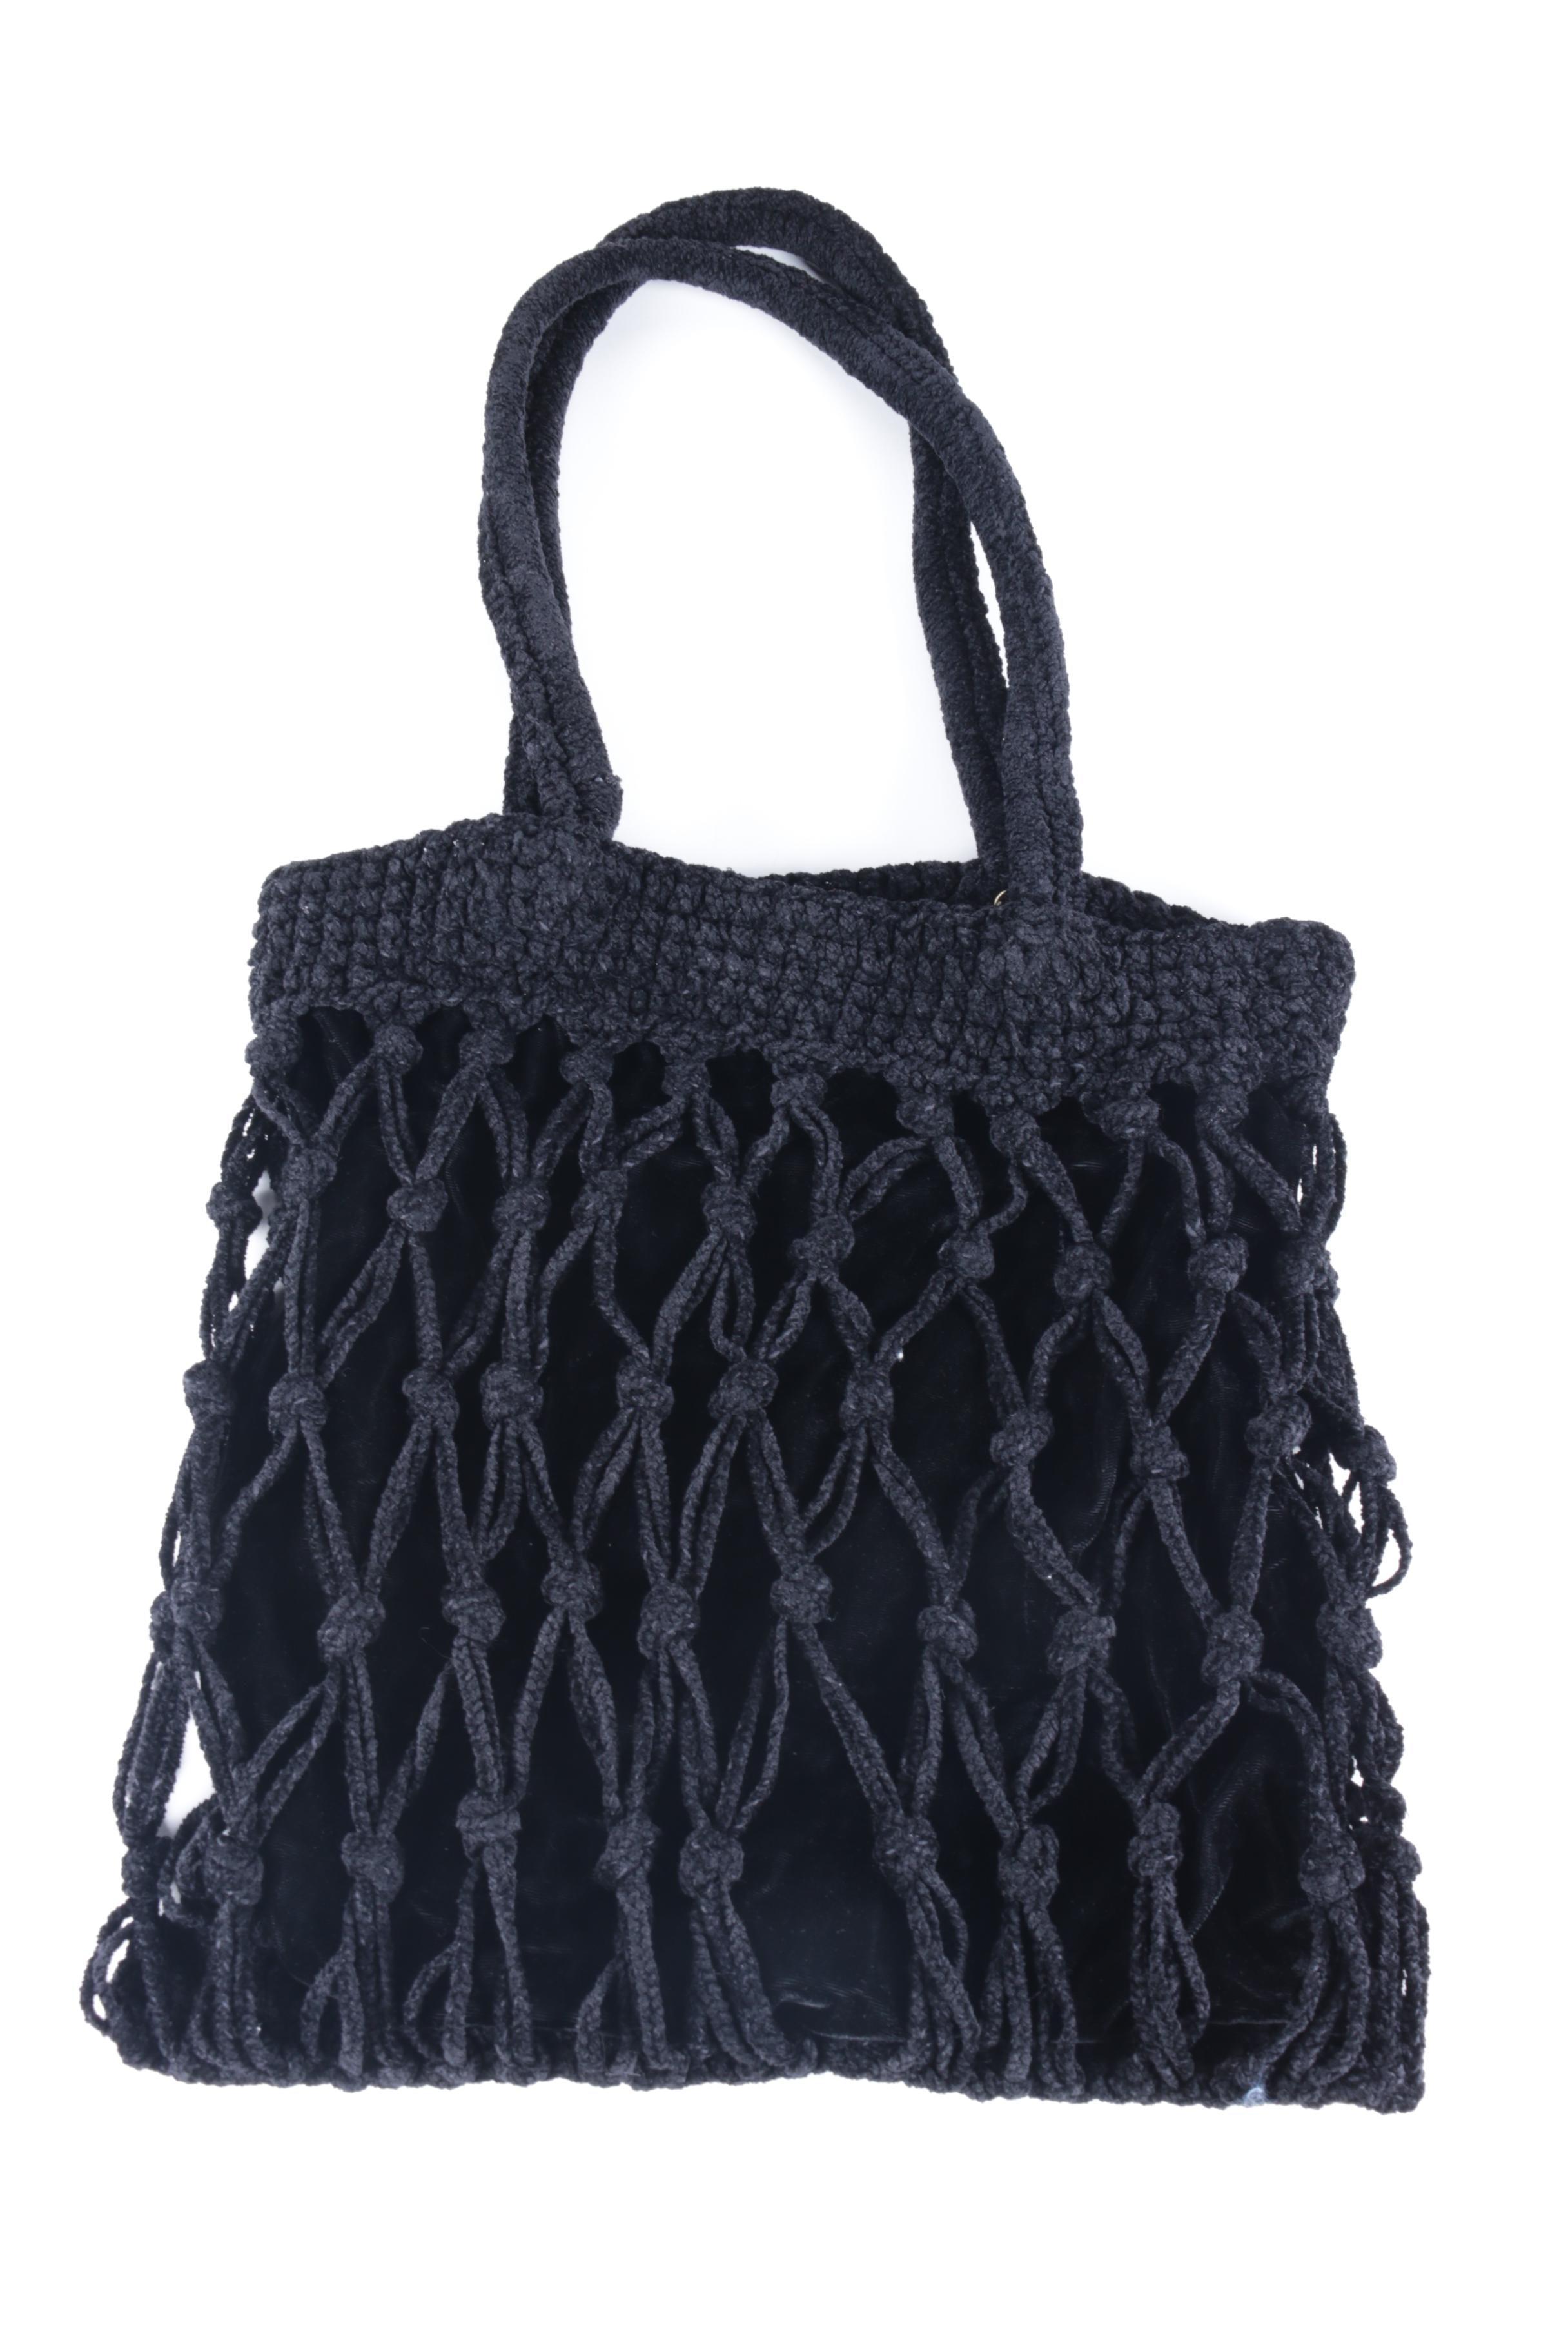 Carrie Forbes Black Macramé Handbag